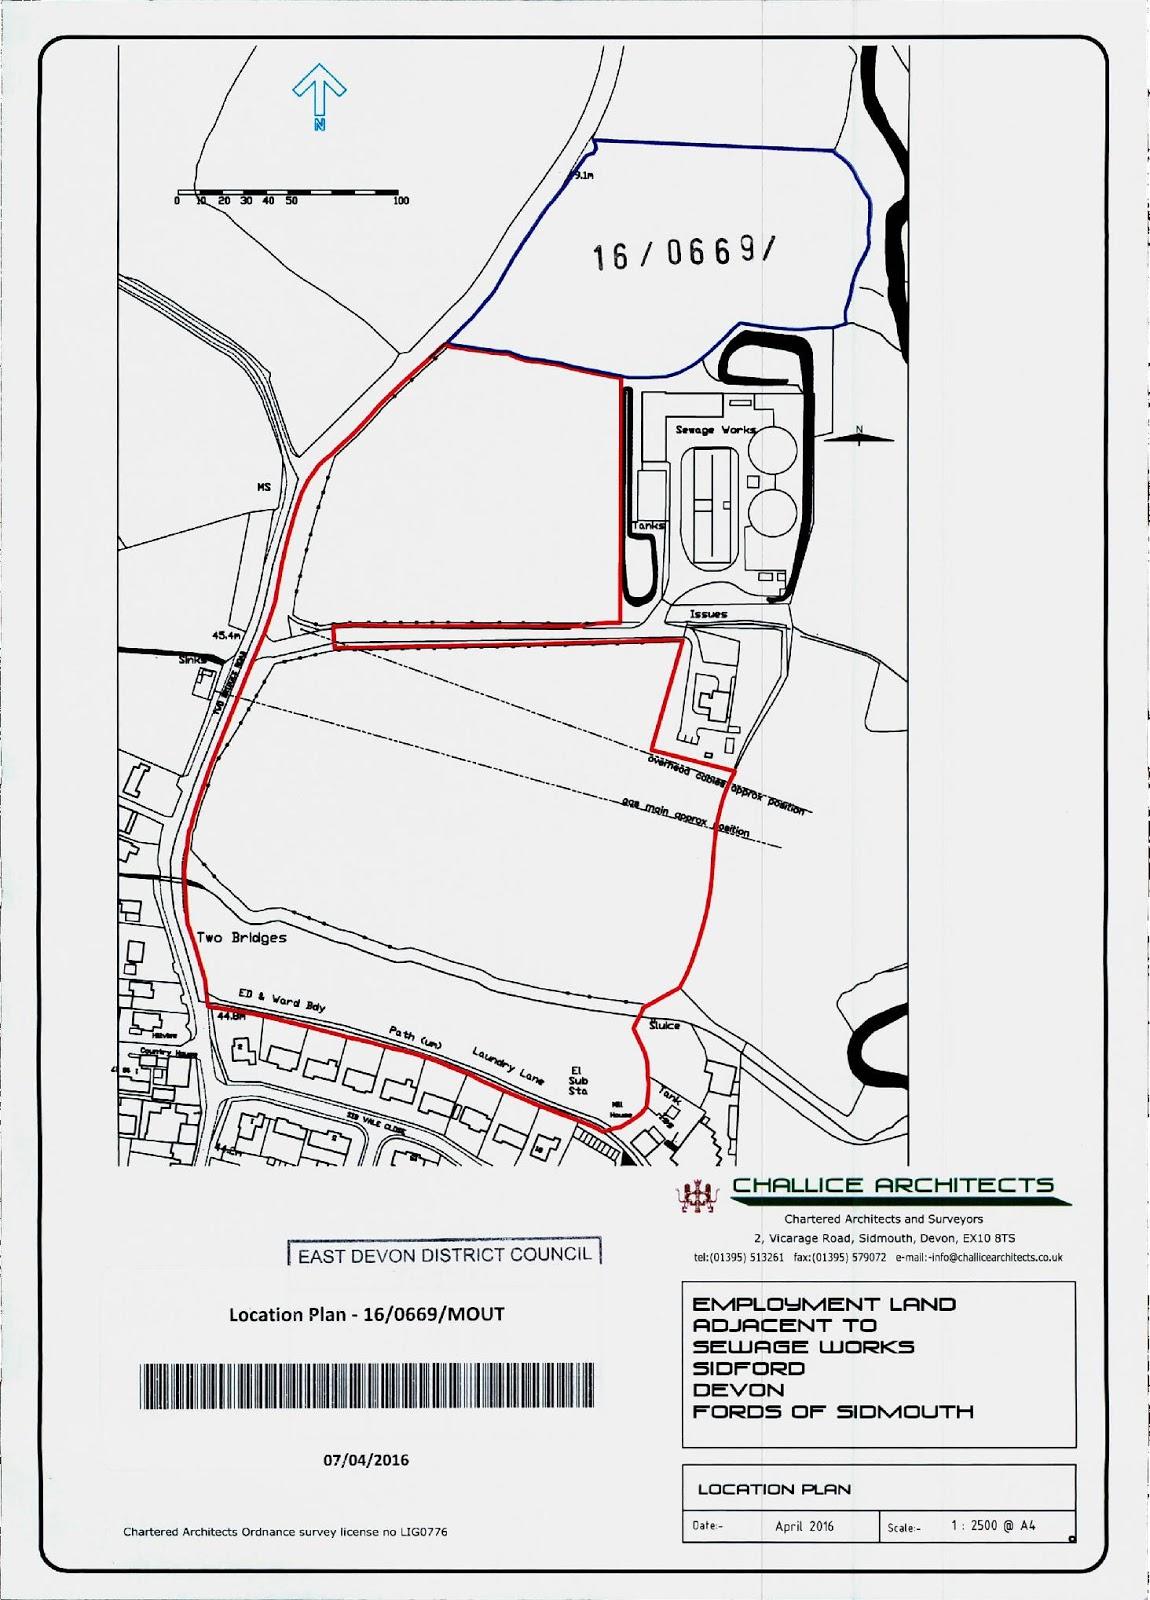 Futures Forum Sidford Business Park Gtgtgt Planning Application Plans